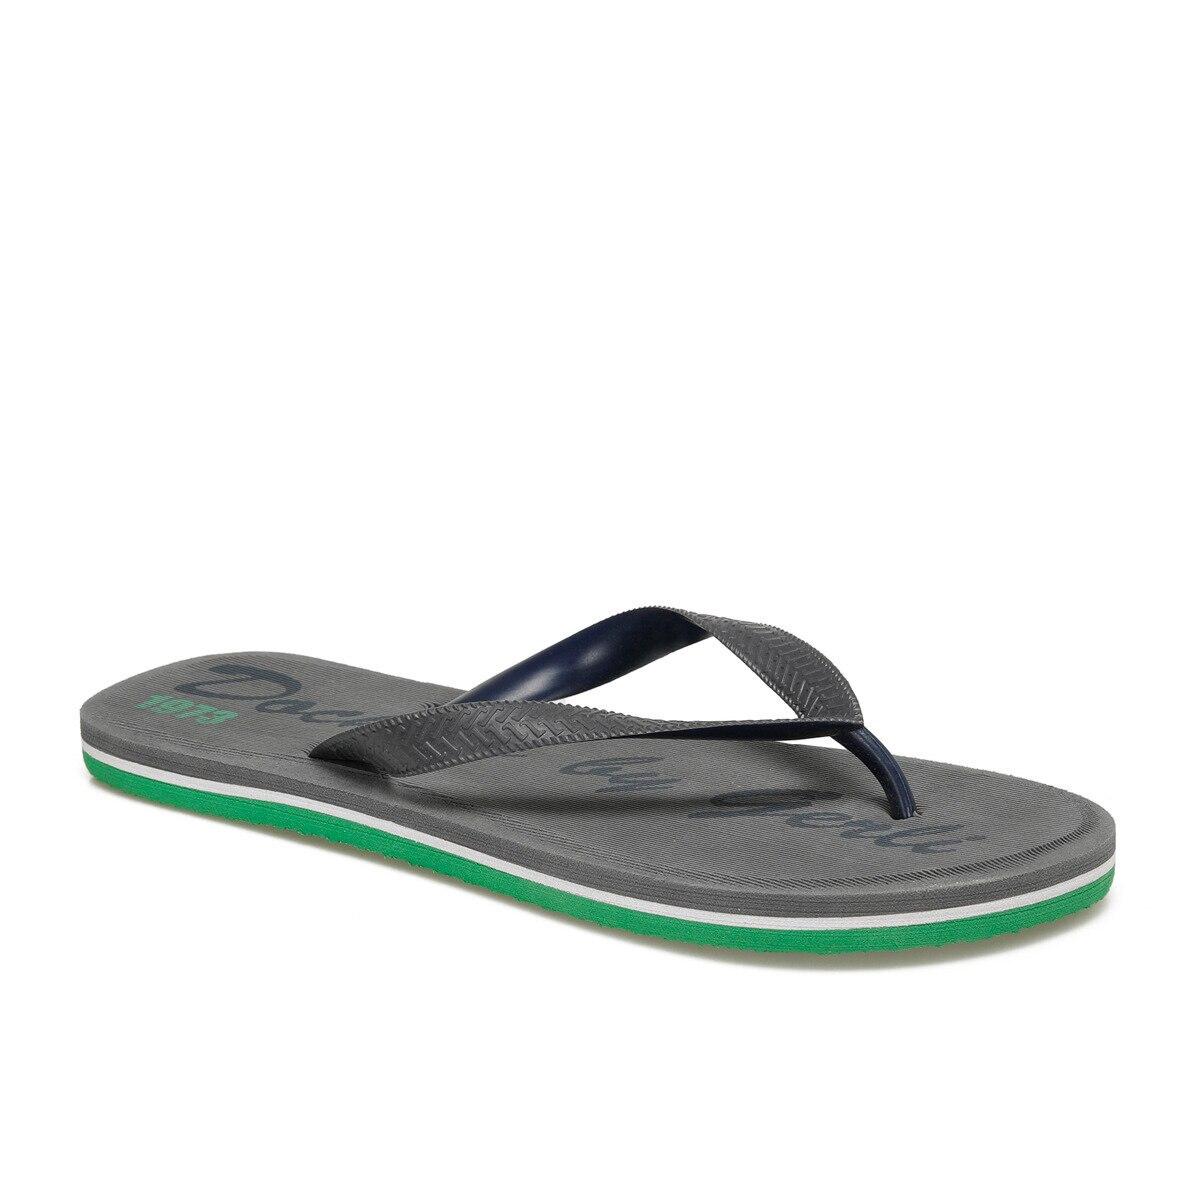 FLO 224599 Dark Gray Men 'S Thong Slippers By Dockers The Gerle